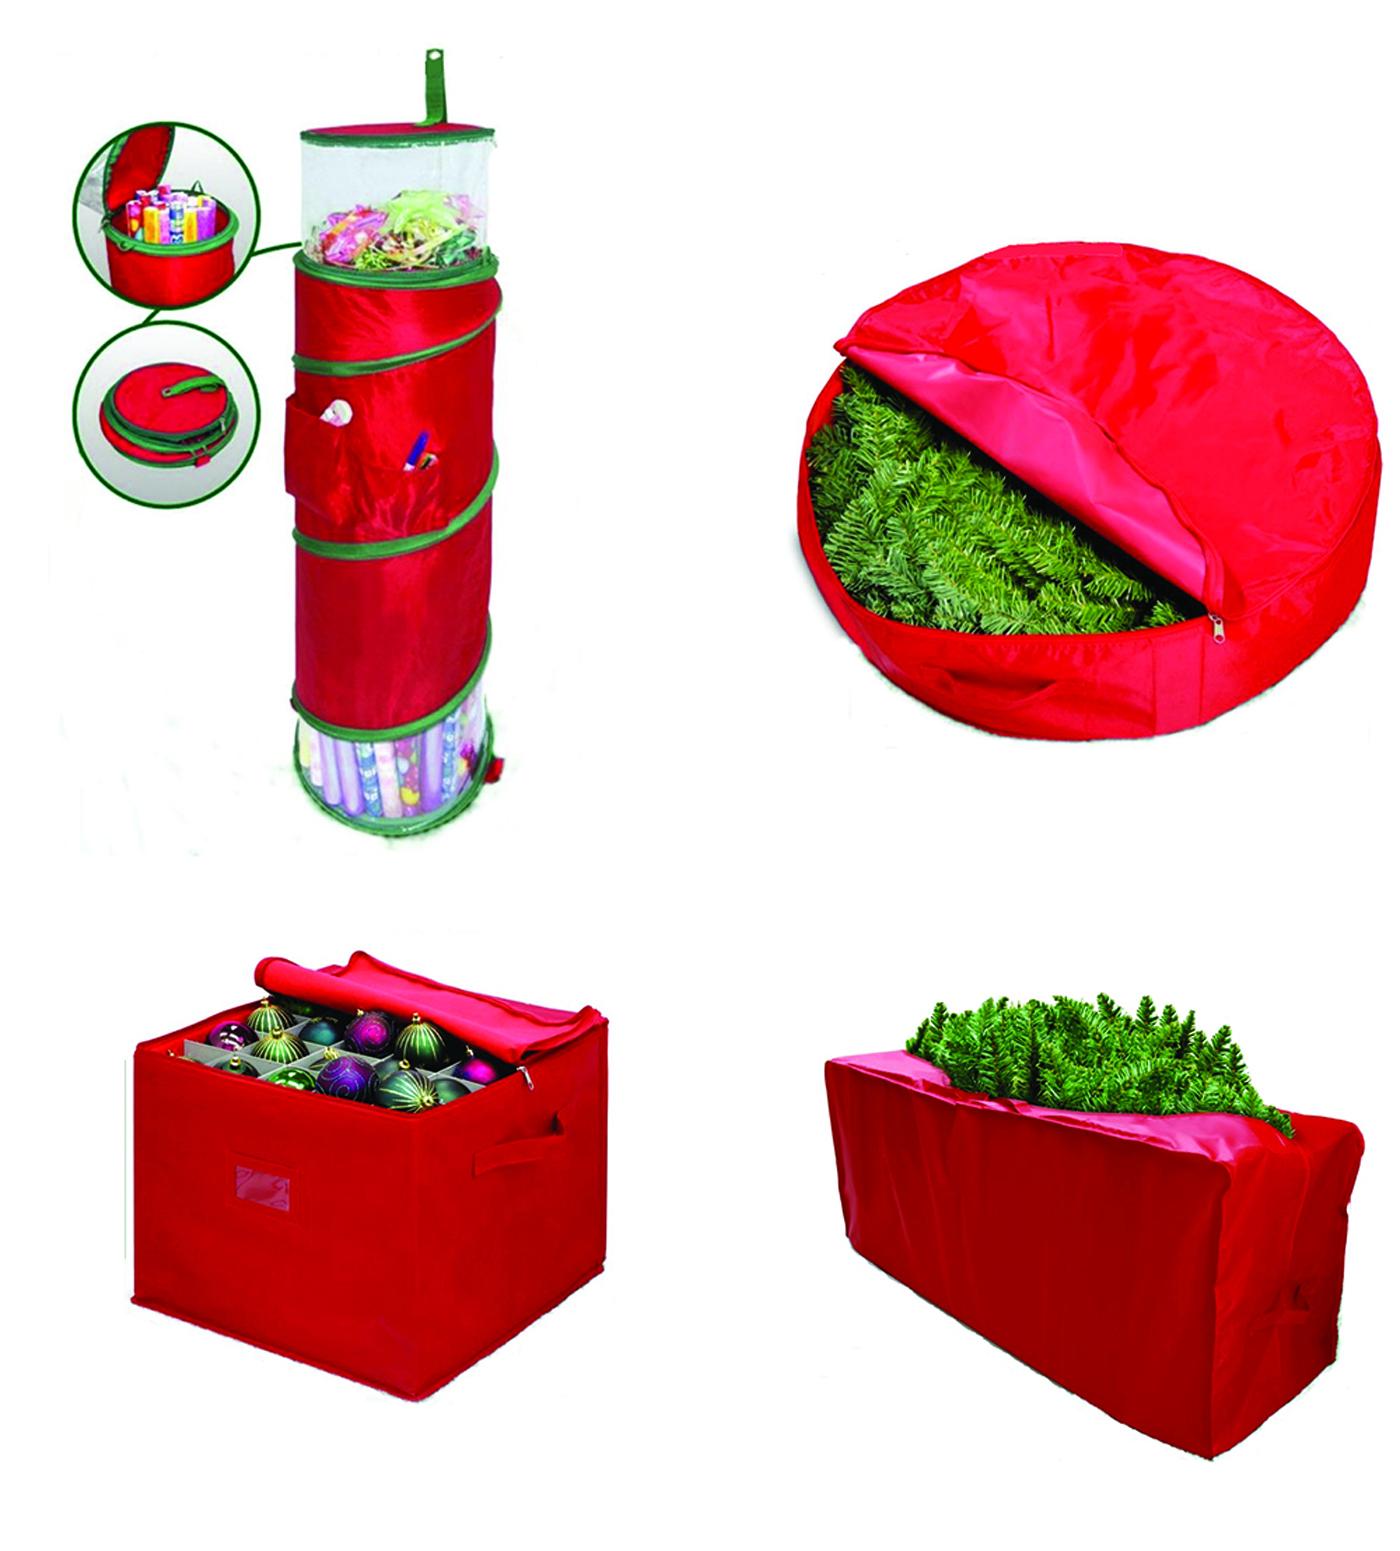 Christmas Storage Container - Listitdallas